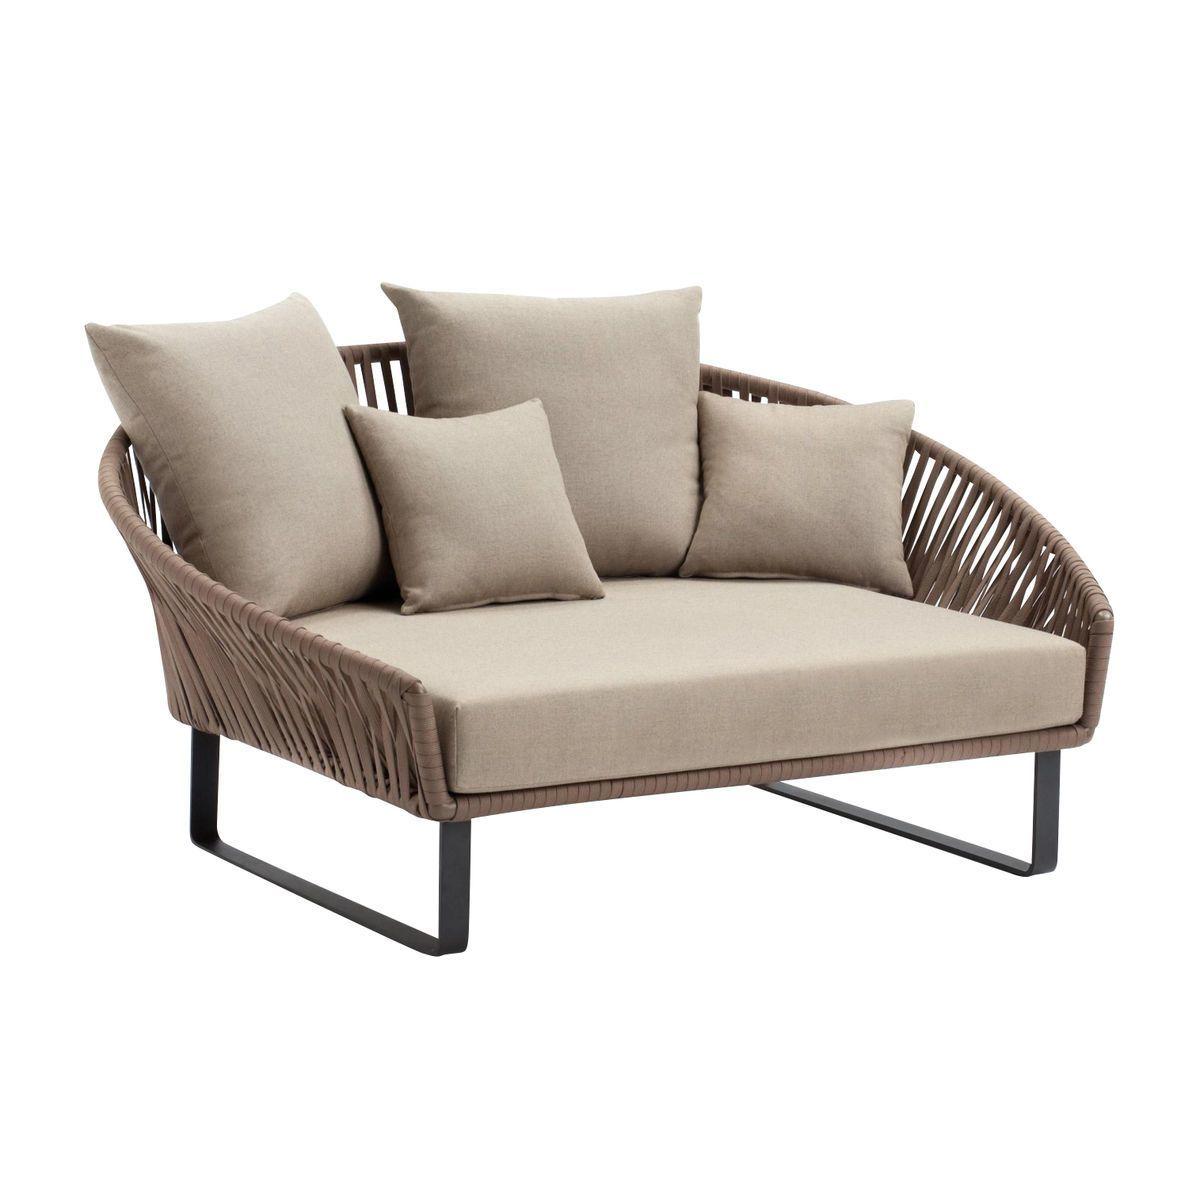 Bargain Garden Furniture